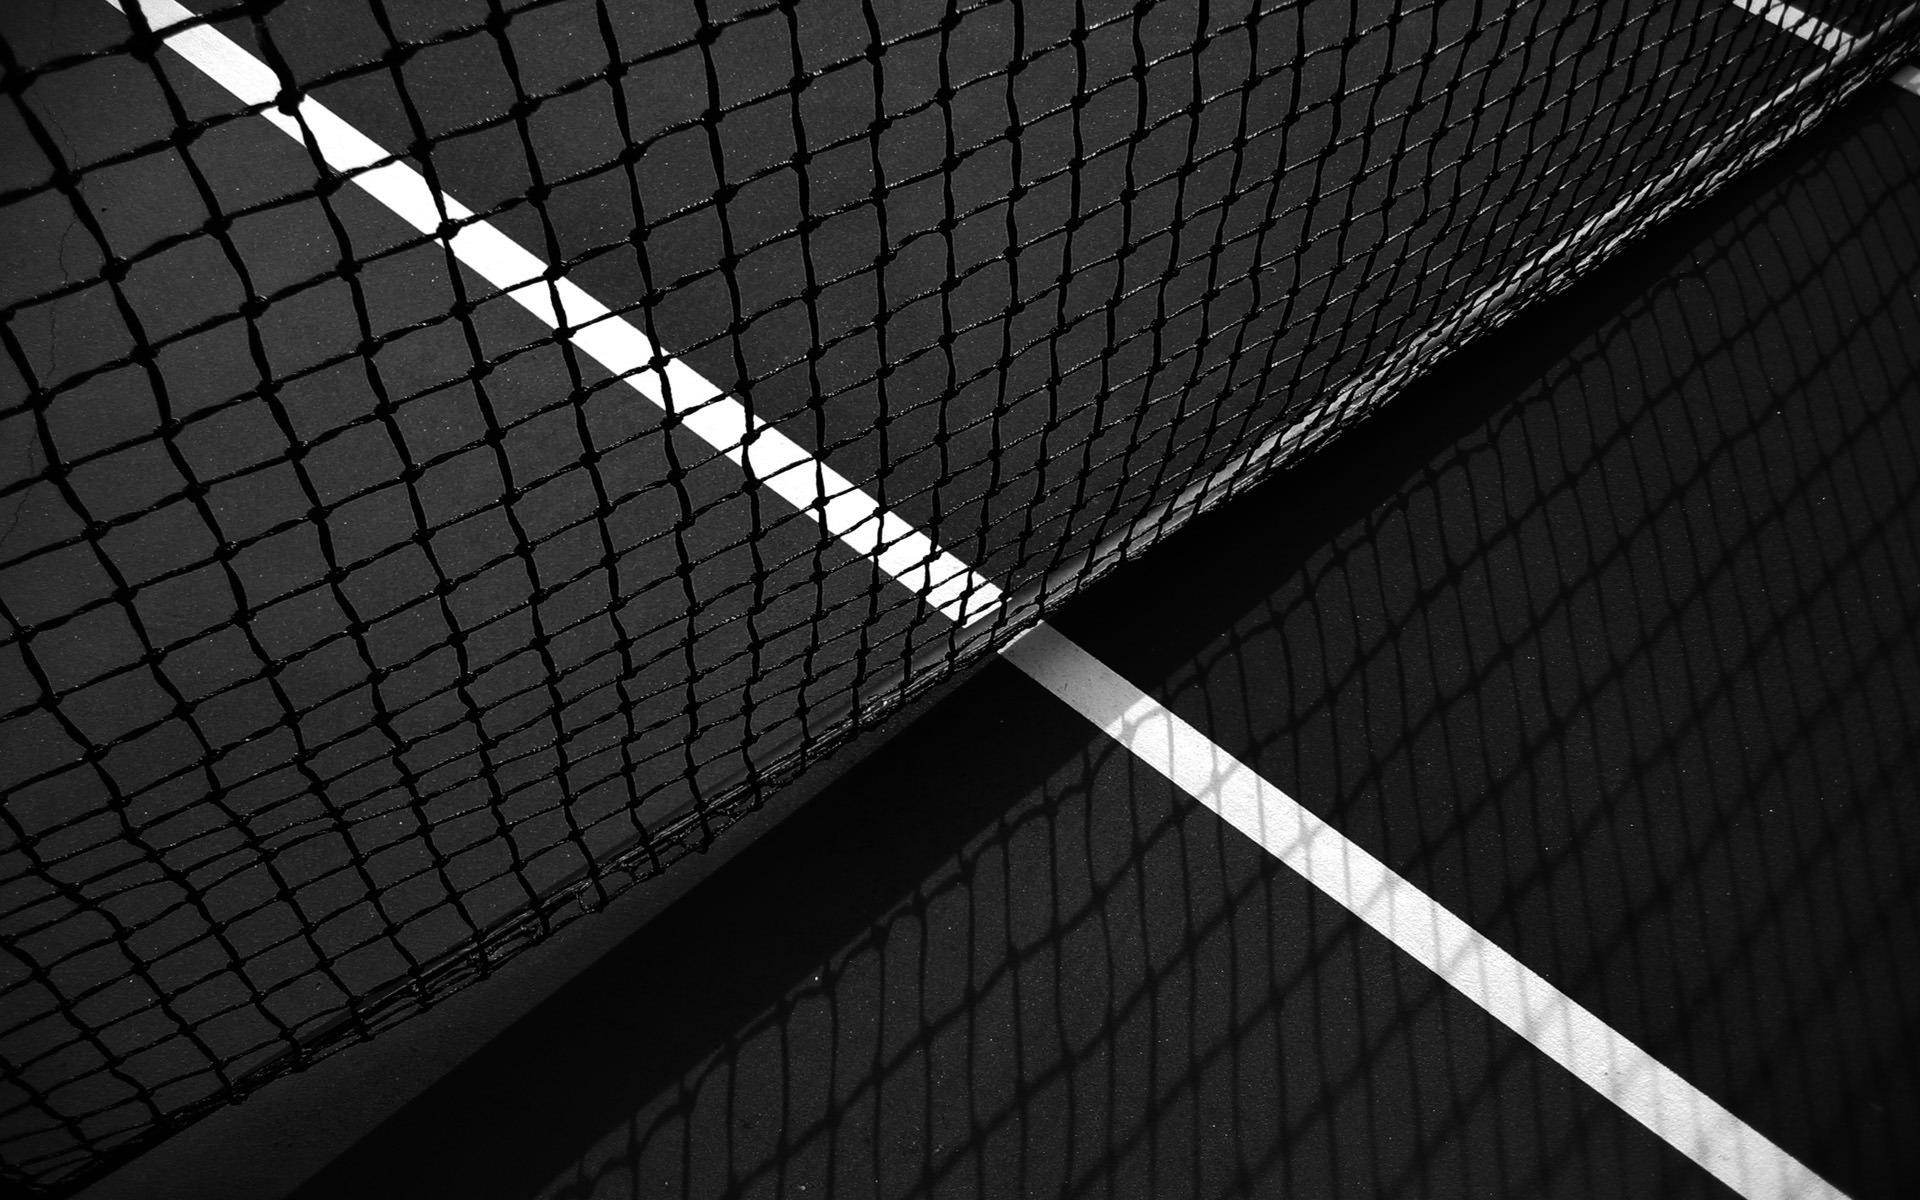 Tennis Wallpapers Hintergrnde 1920x1200 ID234641